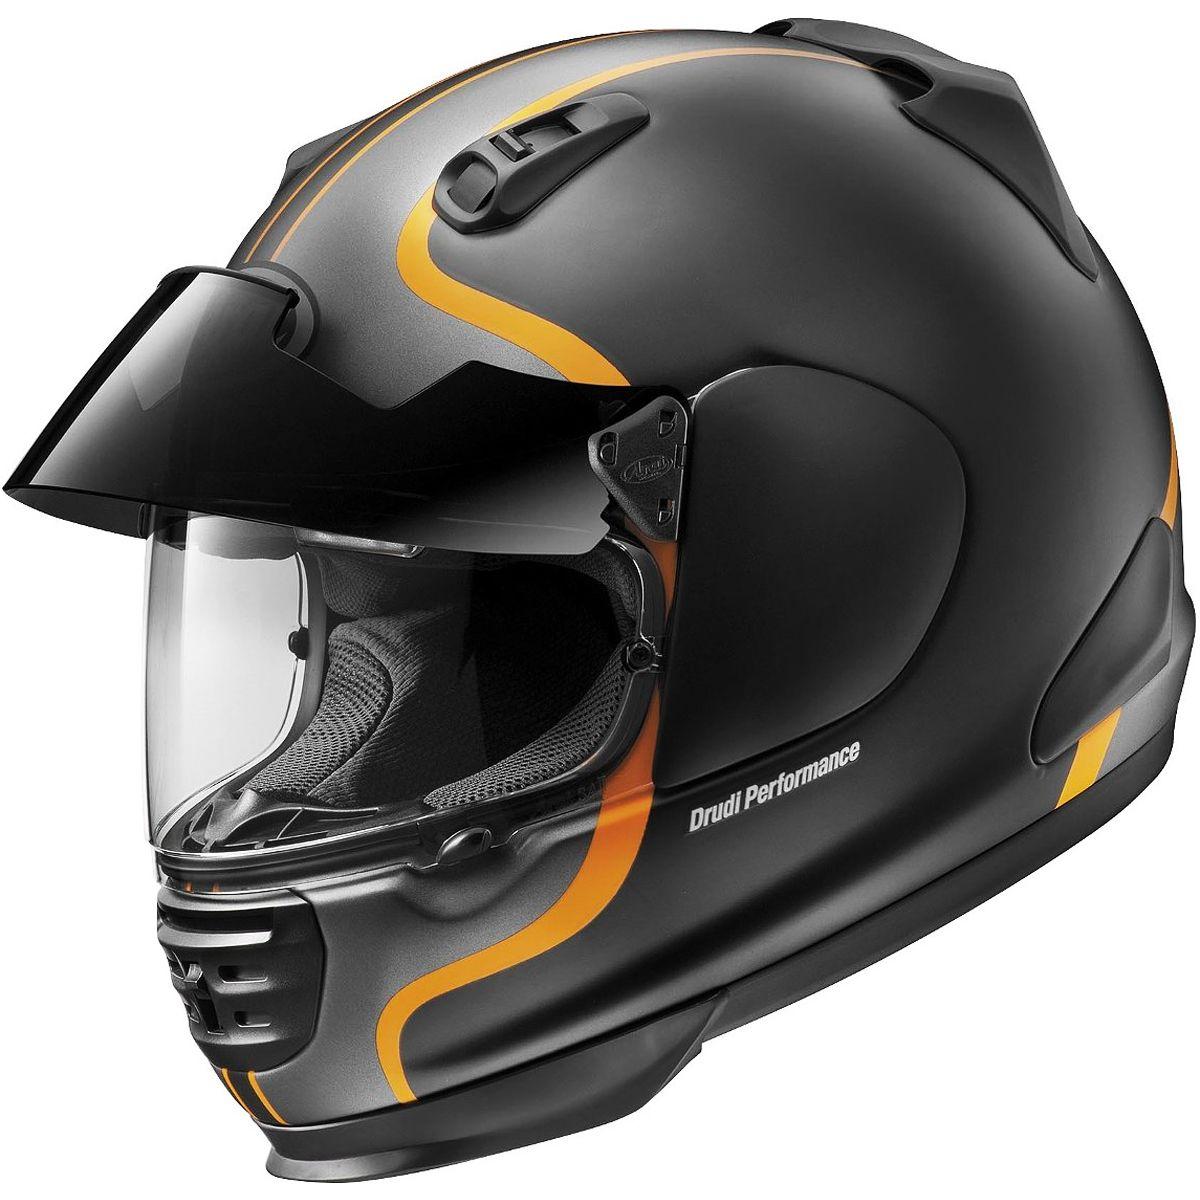 c467ff9268 New Arai Bold Defiant Pro-Cruise Sports Bike Racing Motorcycle Helmet 2016  - Motorhelmets